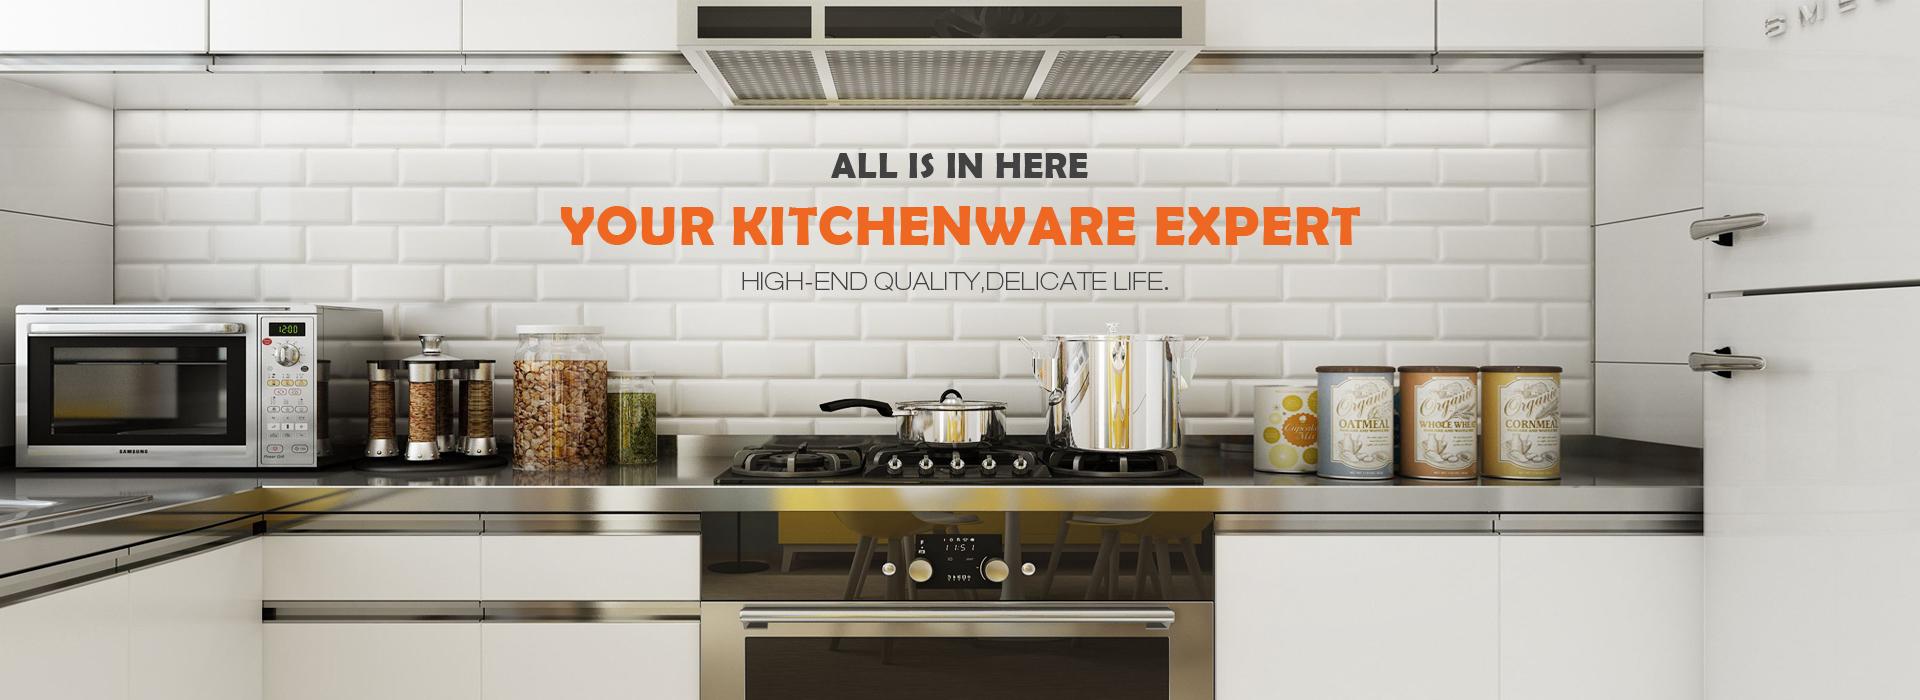 Heshan Netion Kitchen Hardware Co., Ltd. - sauce dispenser, food ...